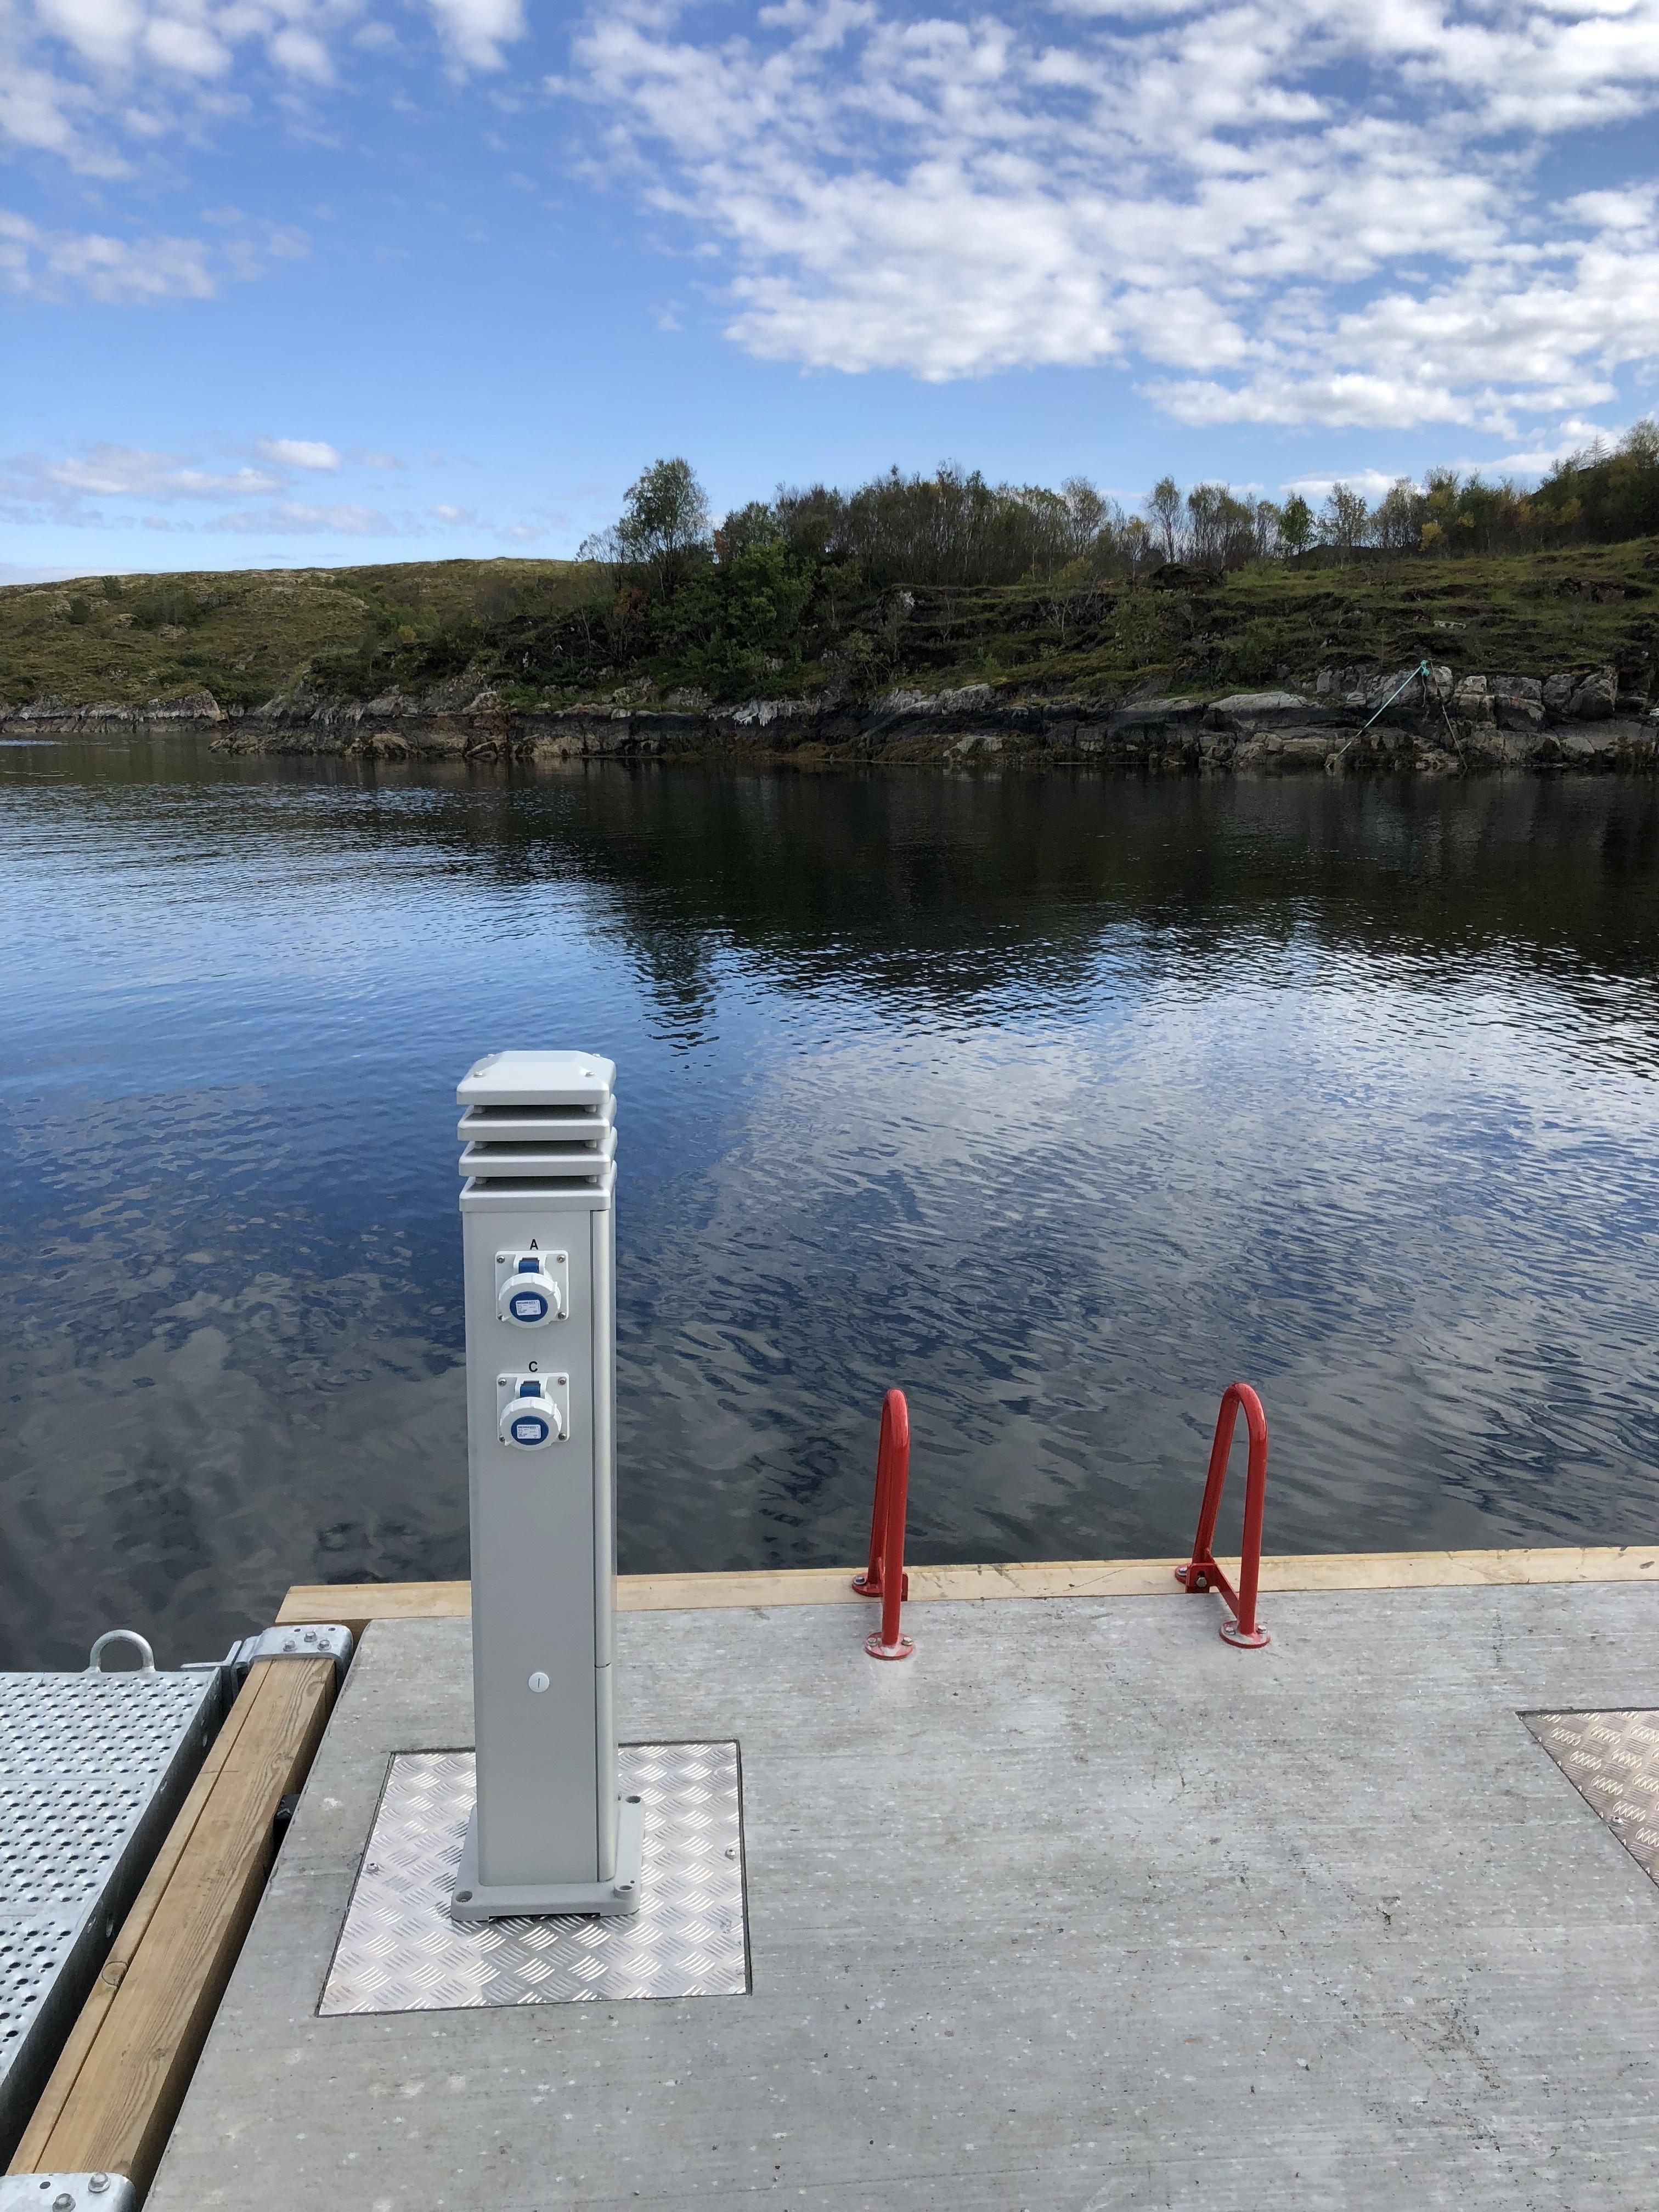 https://www.marinasolutions.no/uploads/Strømsøyler-og-redningsleider-Rørvik-Marina-Solutions-Tallykey2.jpg